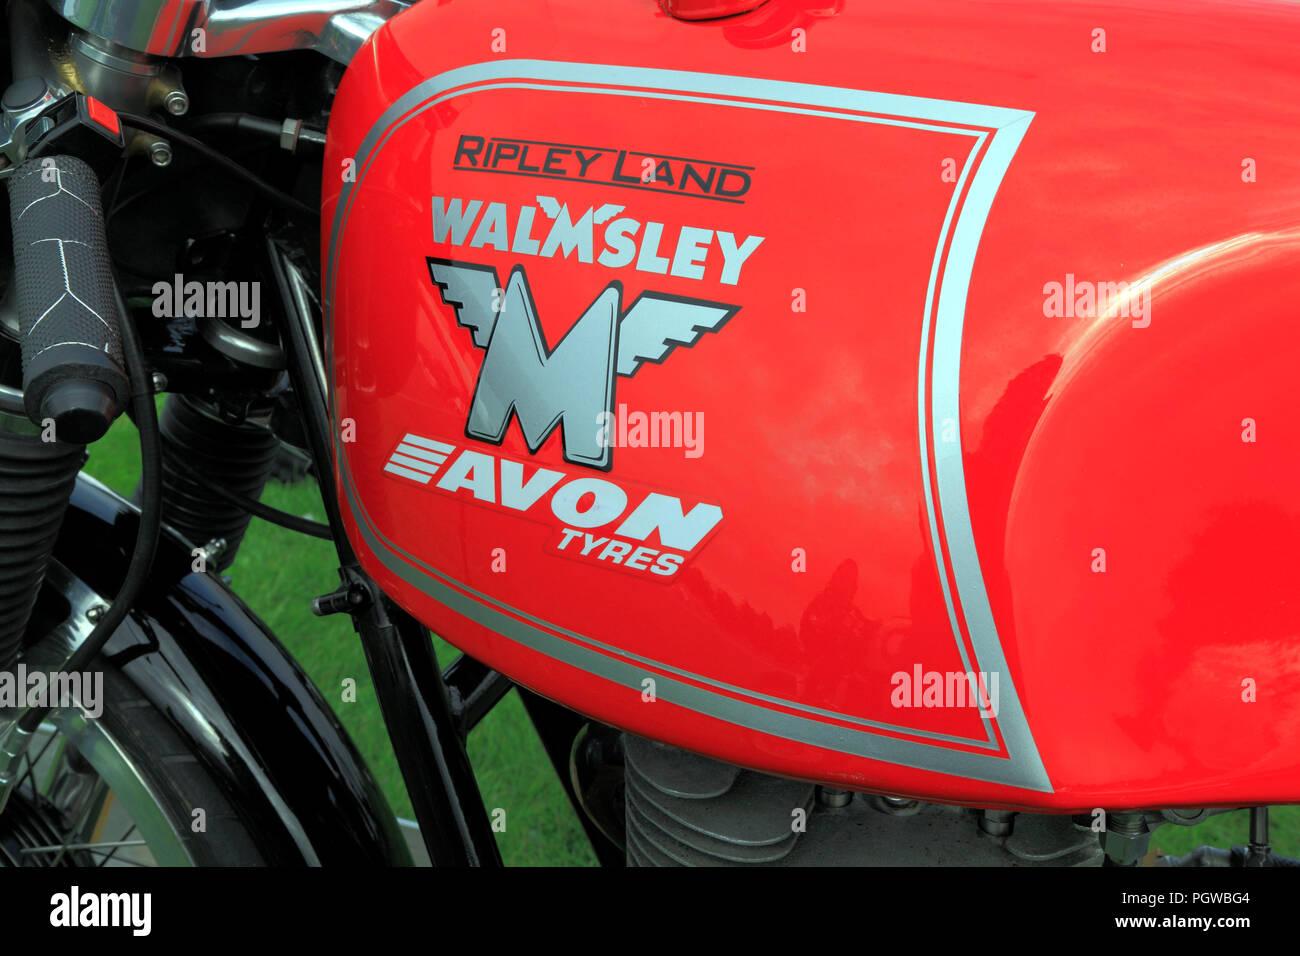 Ripley Terre, Walmsley, Pneus Avon moto, moto, logo Photo Stock